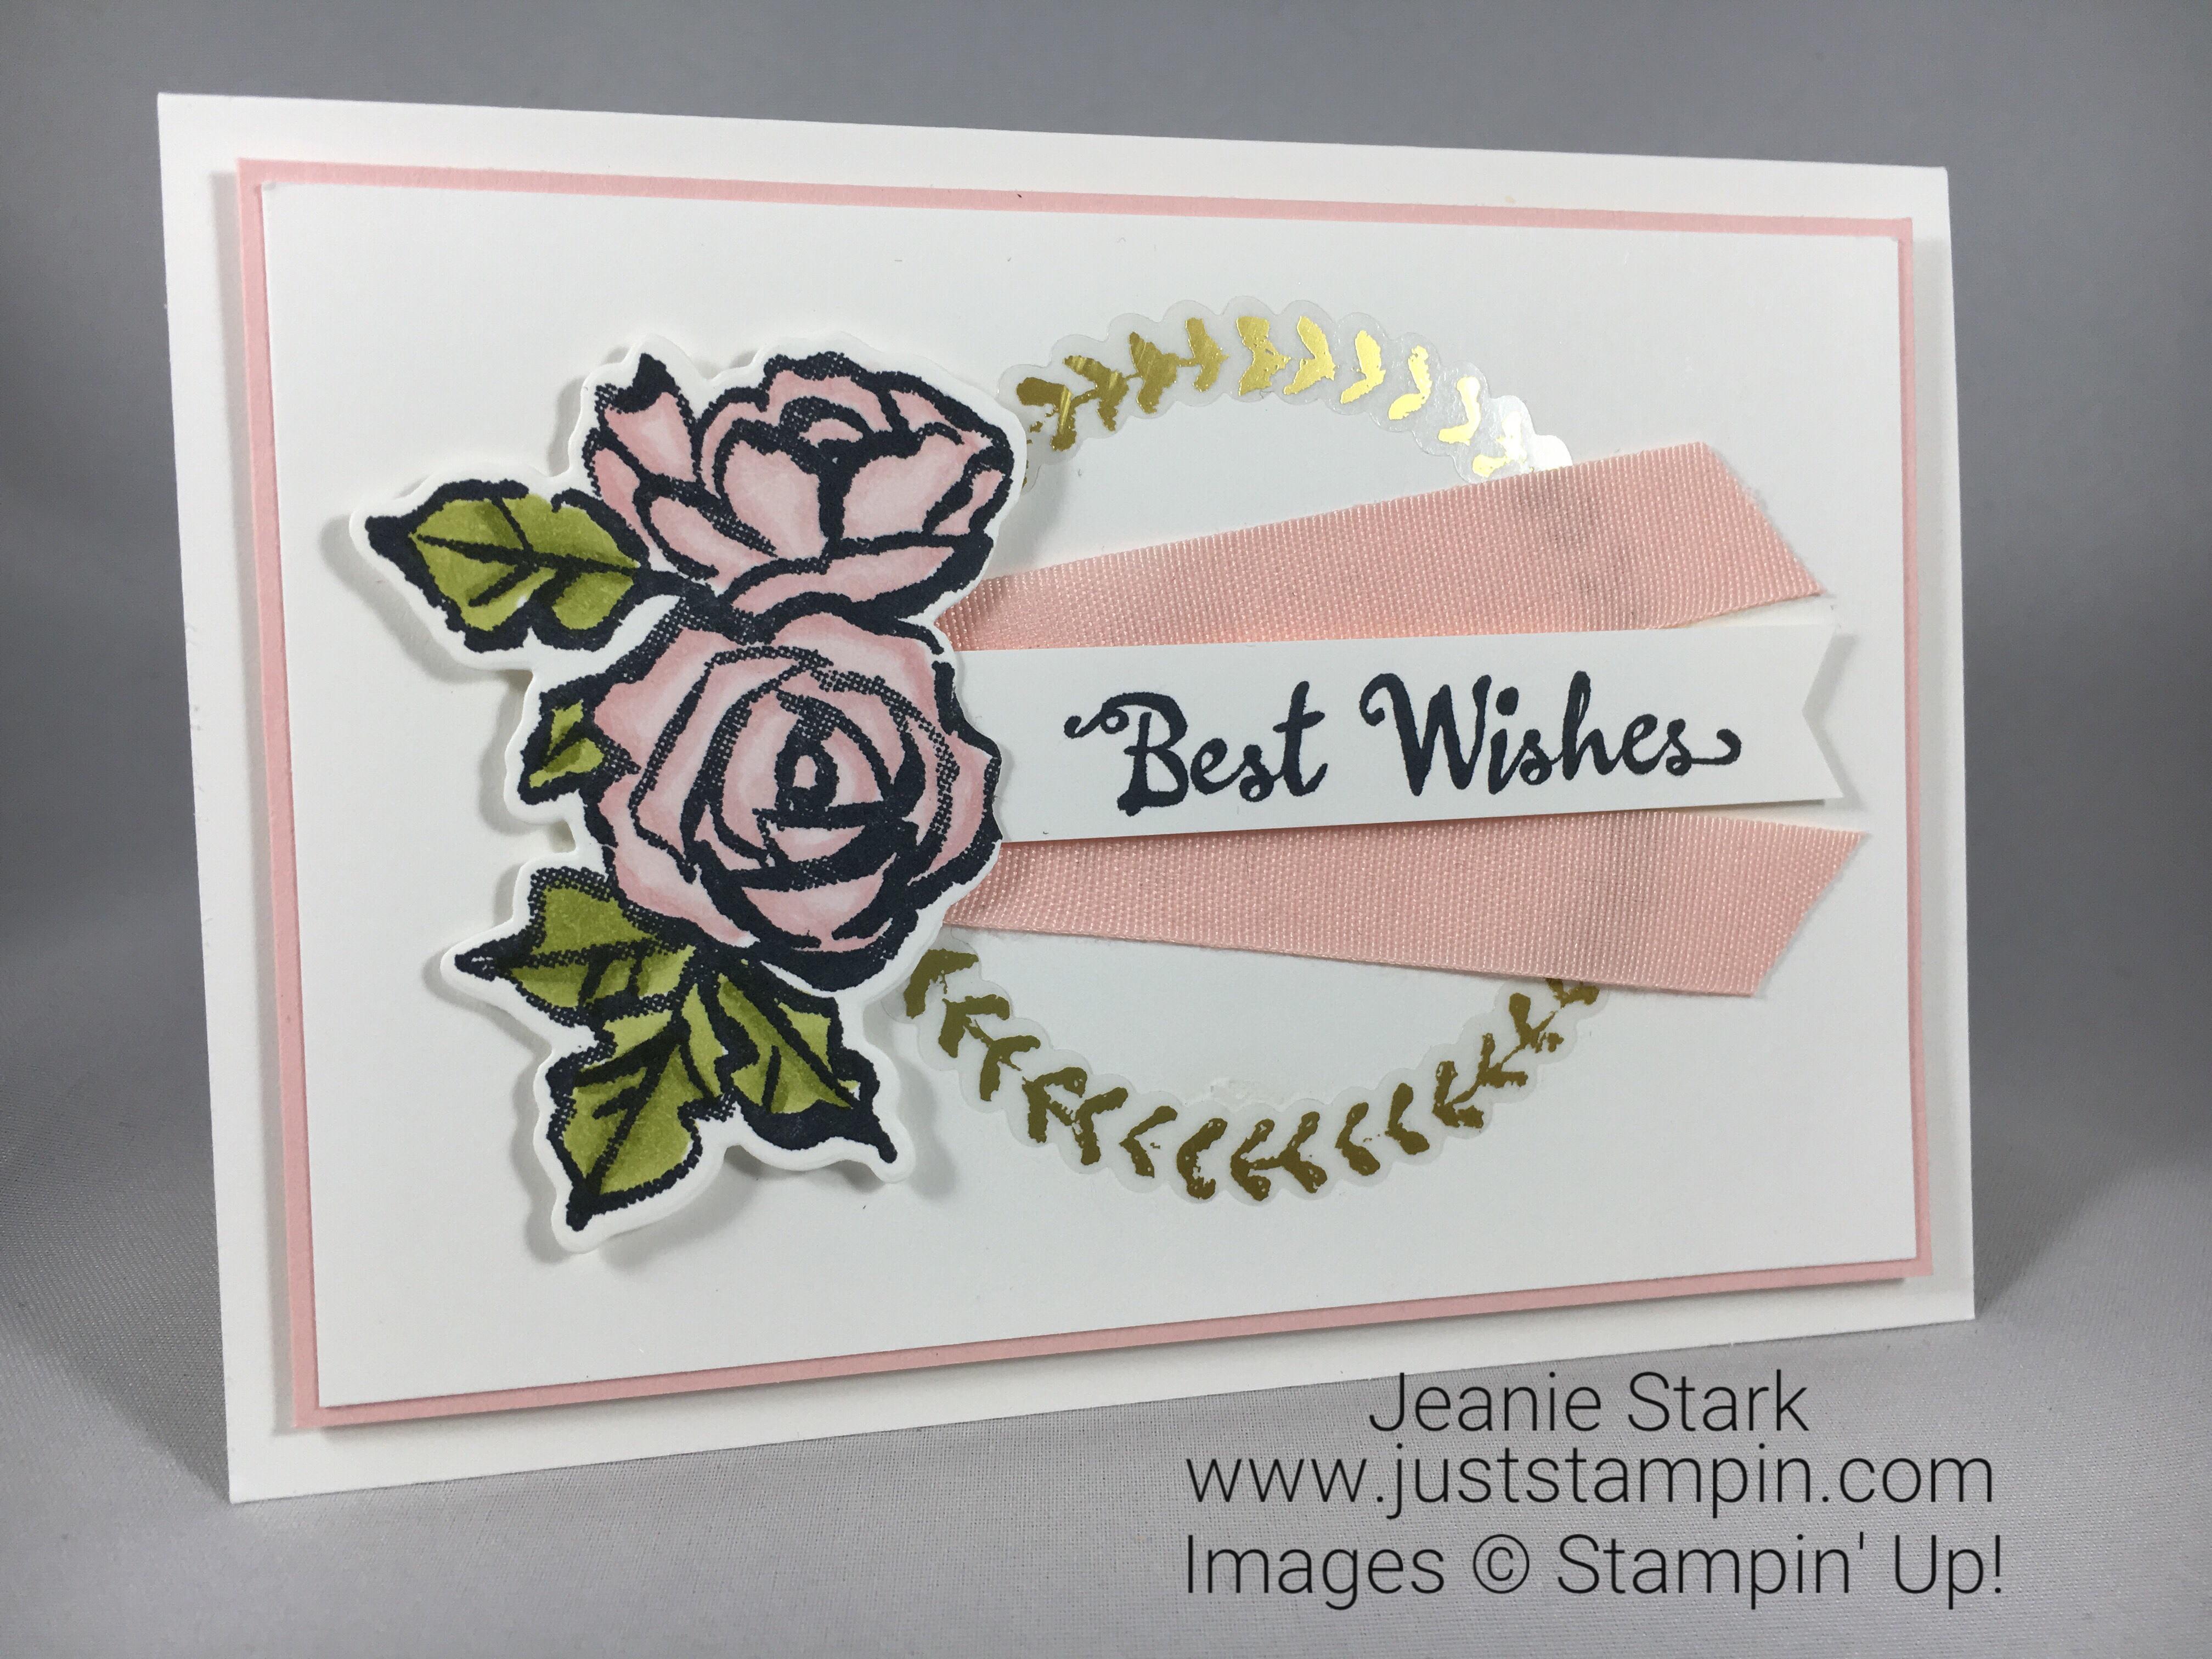 Stampin Up Petal Palette Wedding Card idea - Jeanie Stark StampinUp